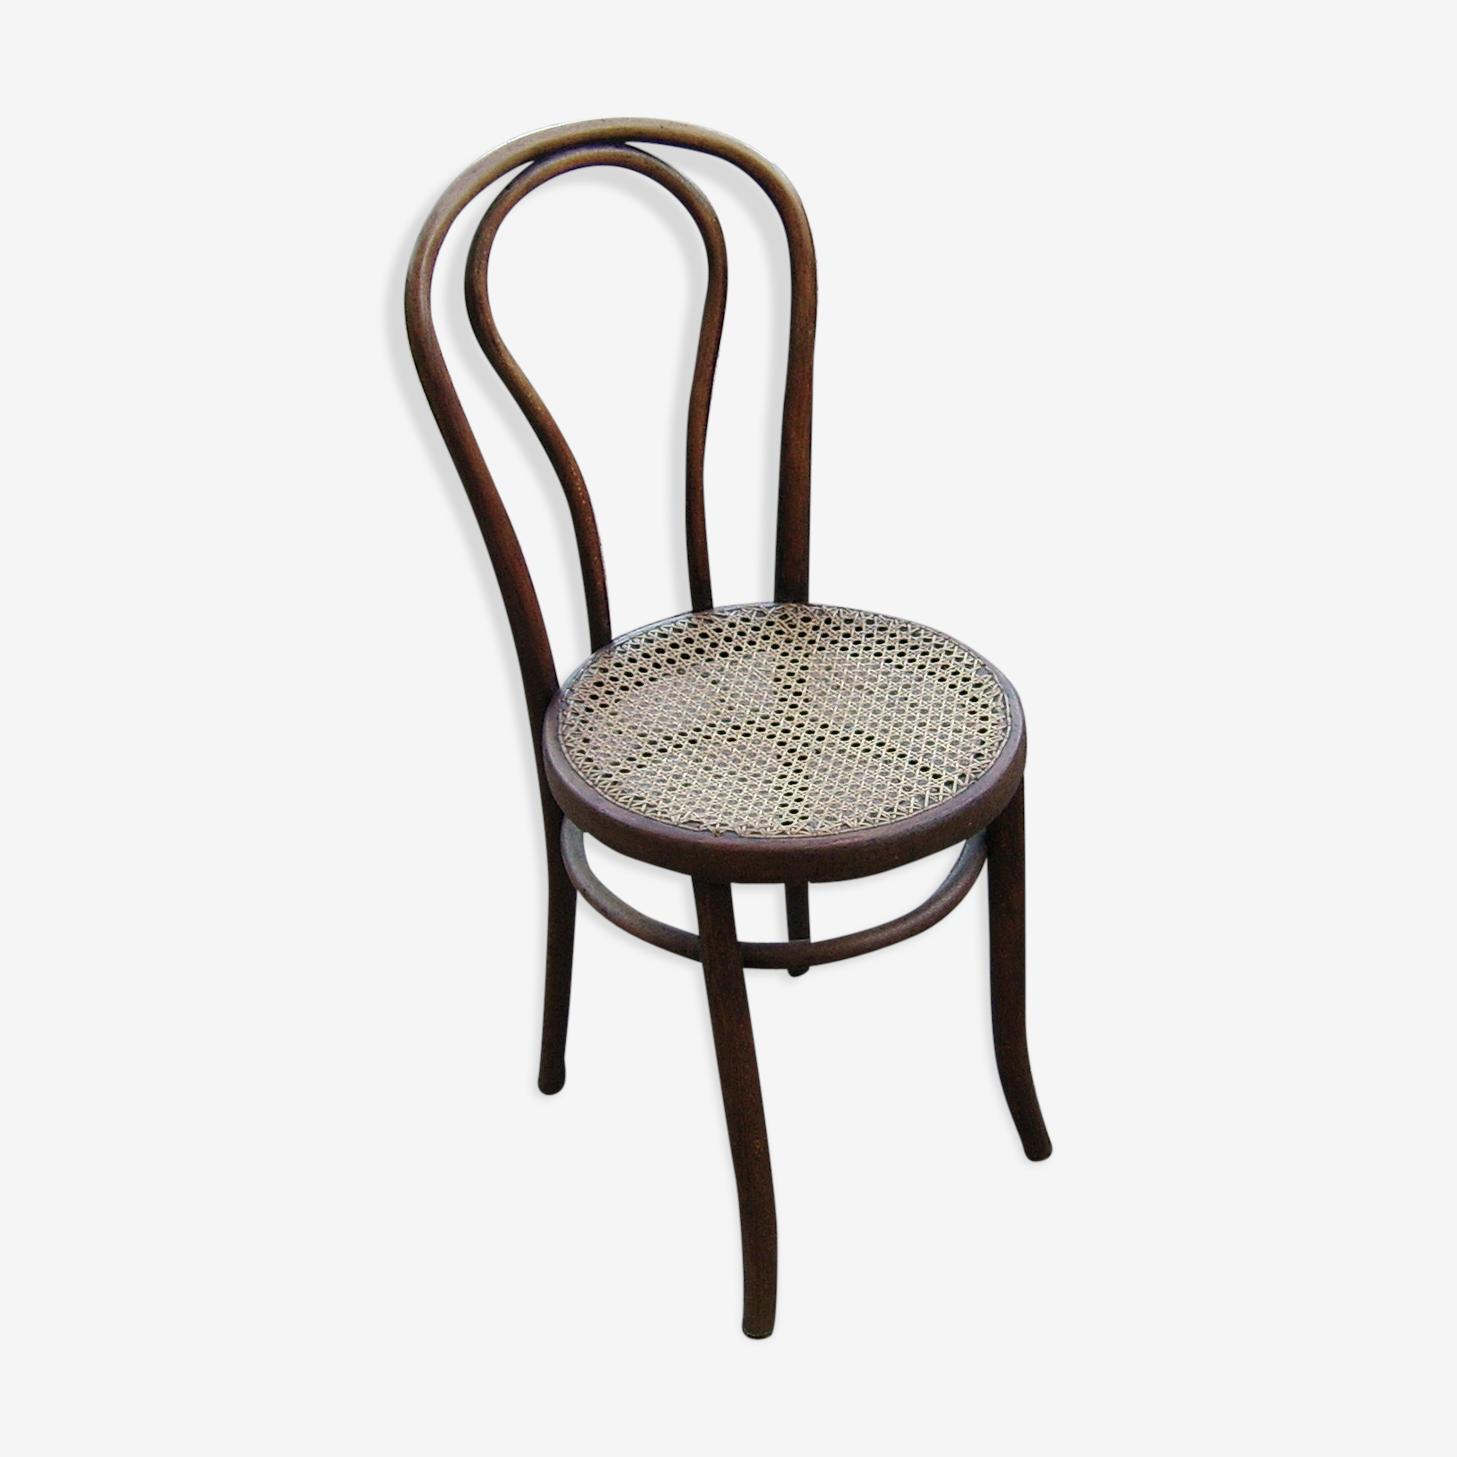 Wooden Fischel bistro chair